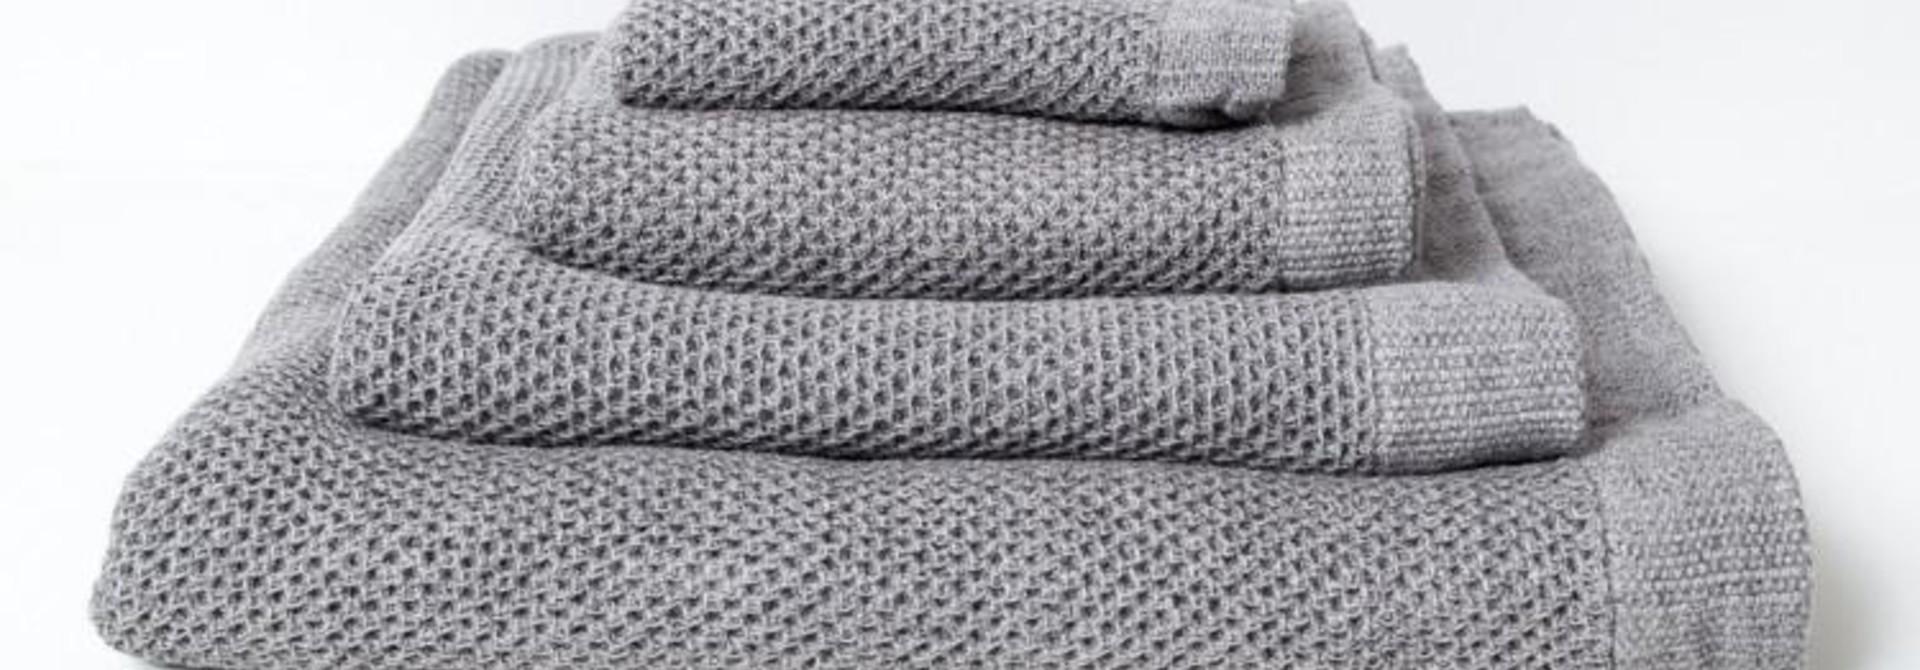 Lattice Hand Towel - Ice Grey